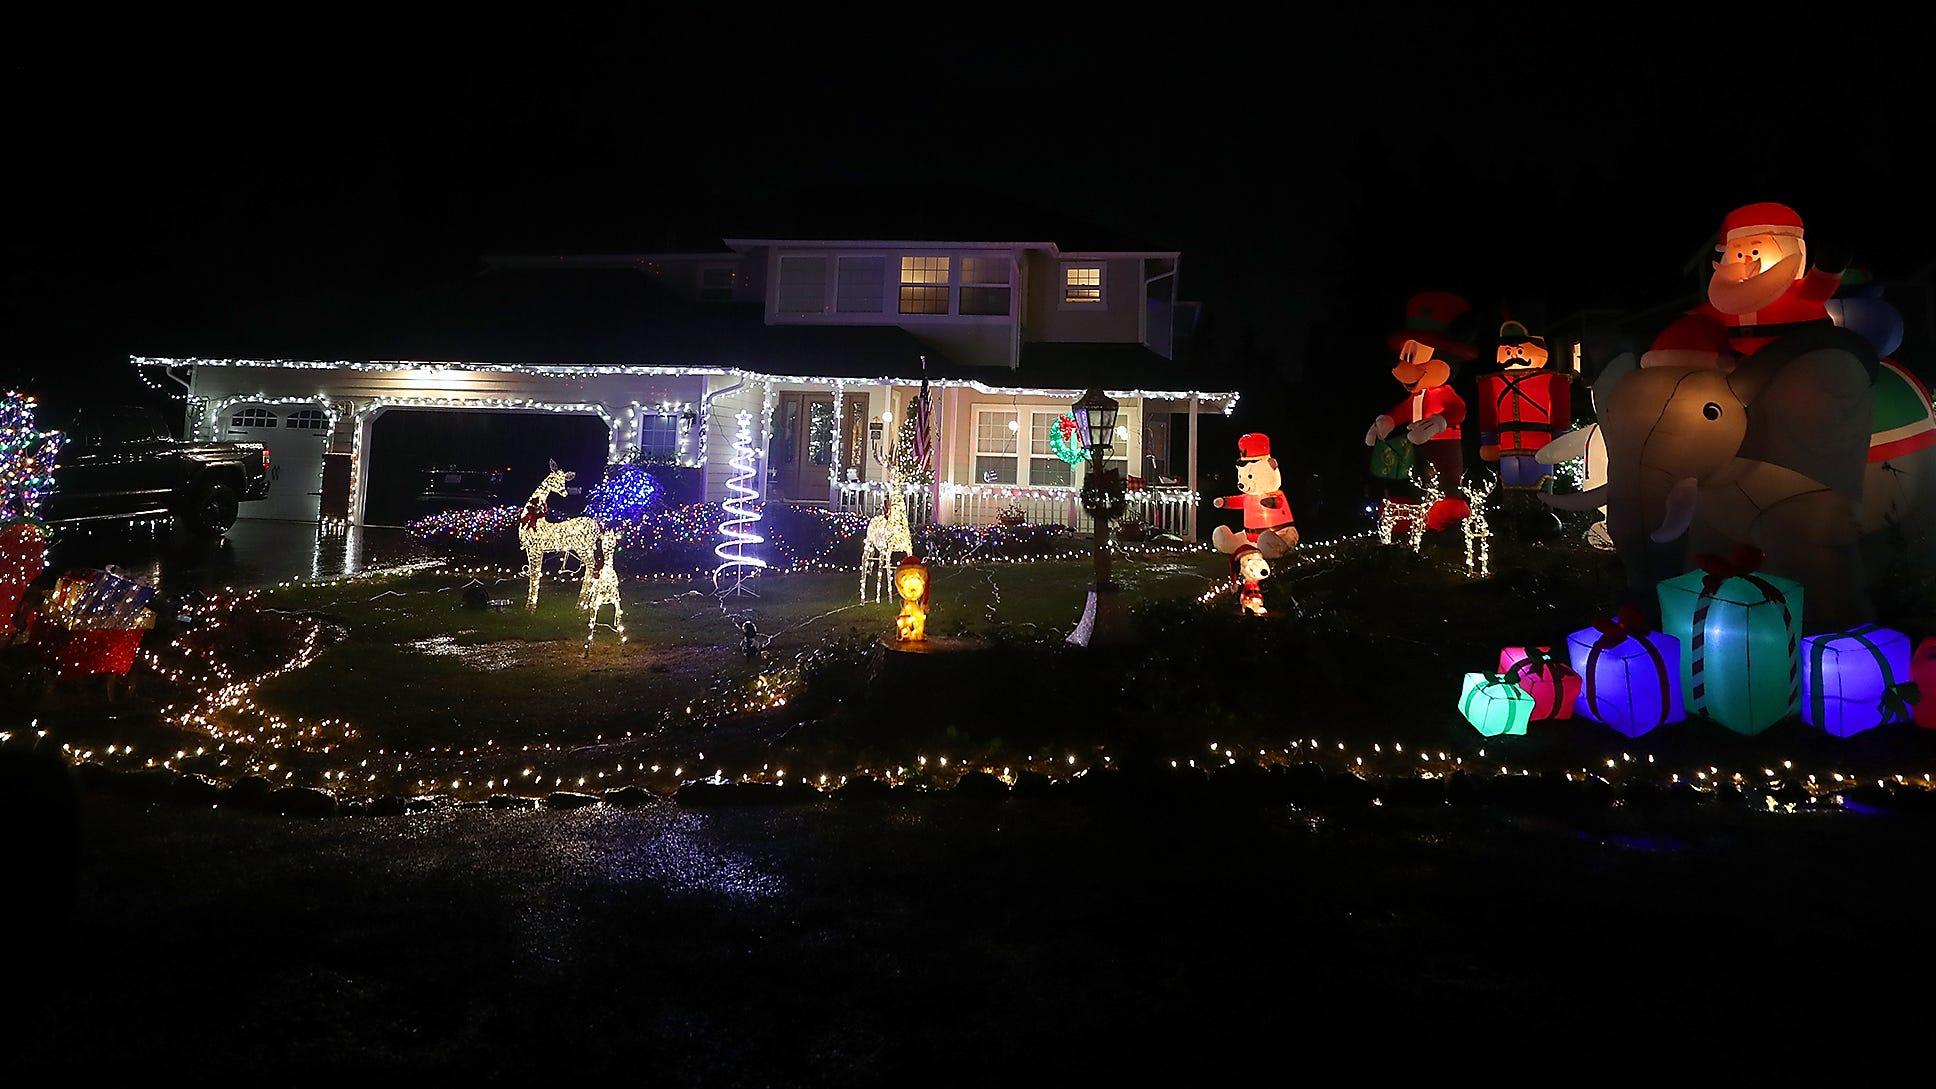 Where To See Christmas Lights Near Lakewood Wa 2021 Where To See Christmas Light Displays This Holiday Season